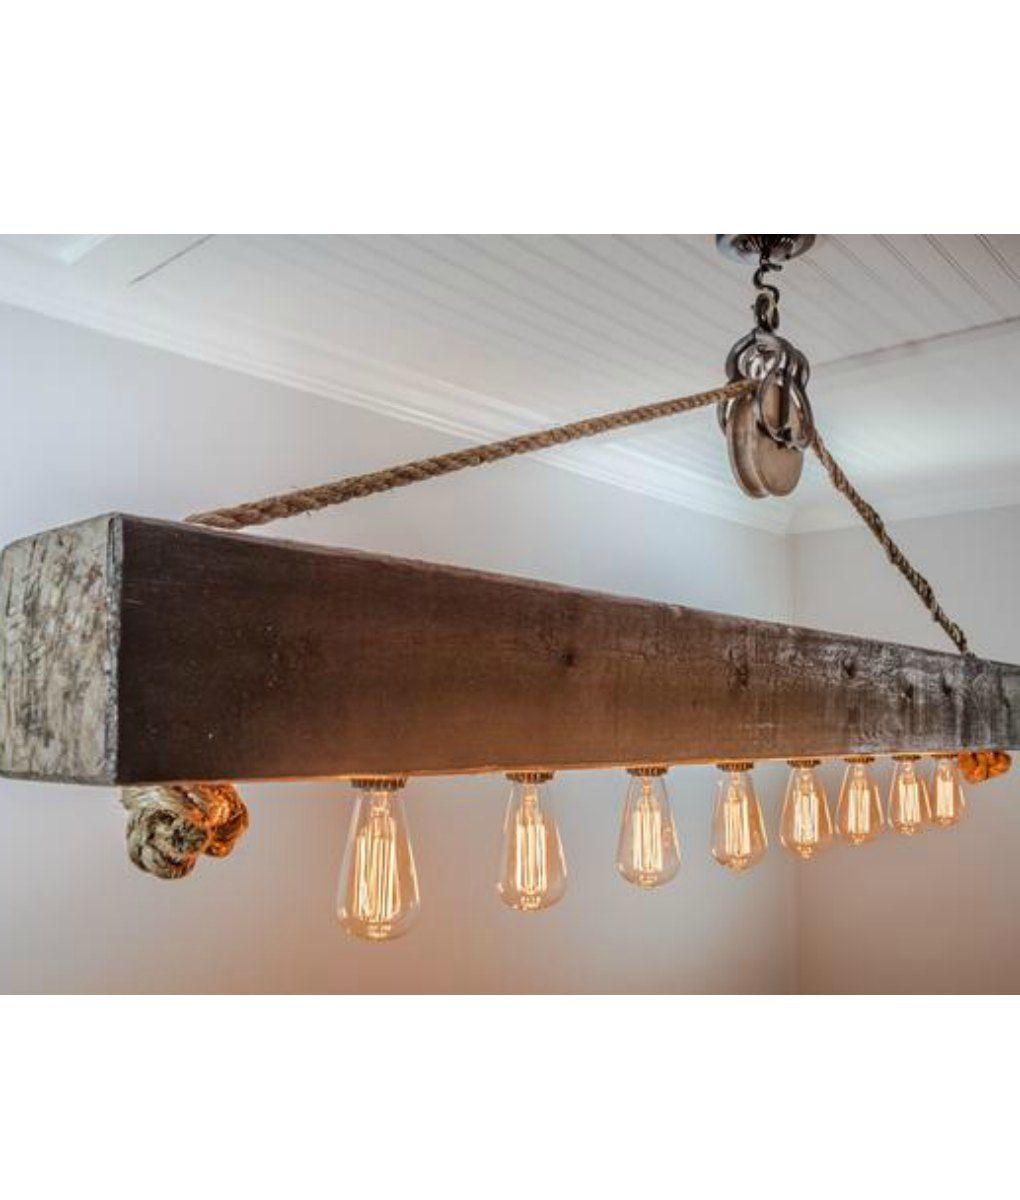 Rustic Lighting Rope Pendant Light Rope Light Wood Beam: Rustic Wood Beam Chandelier With Edison Bulbs, Rope